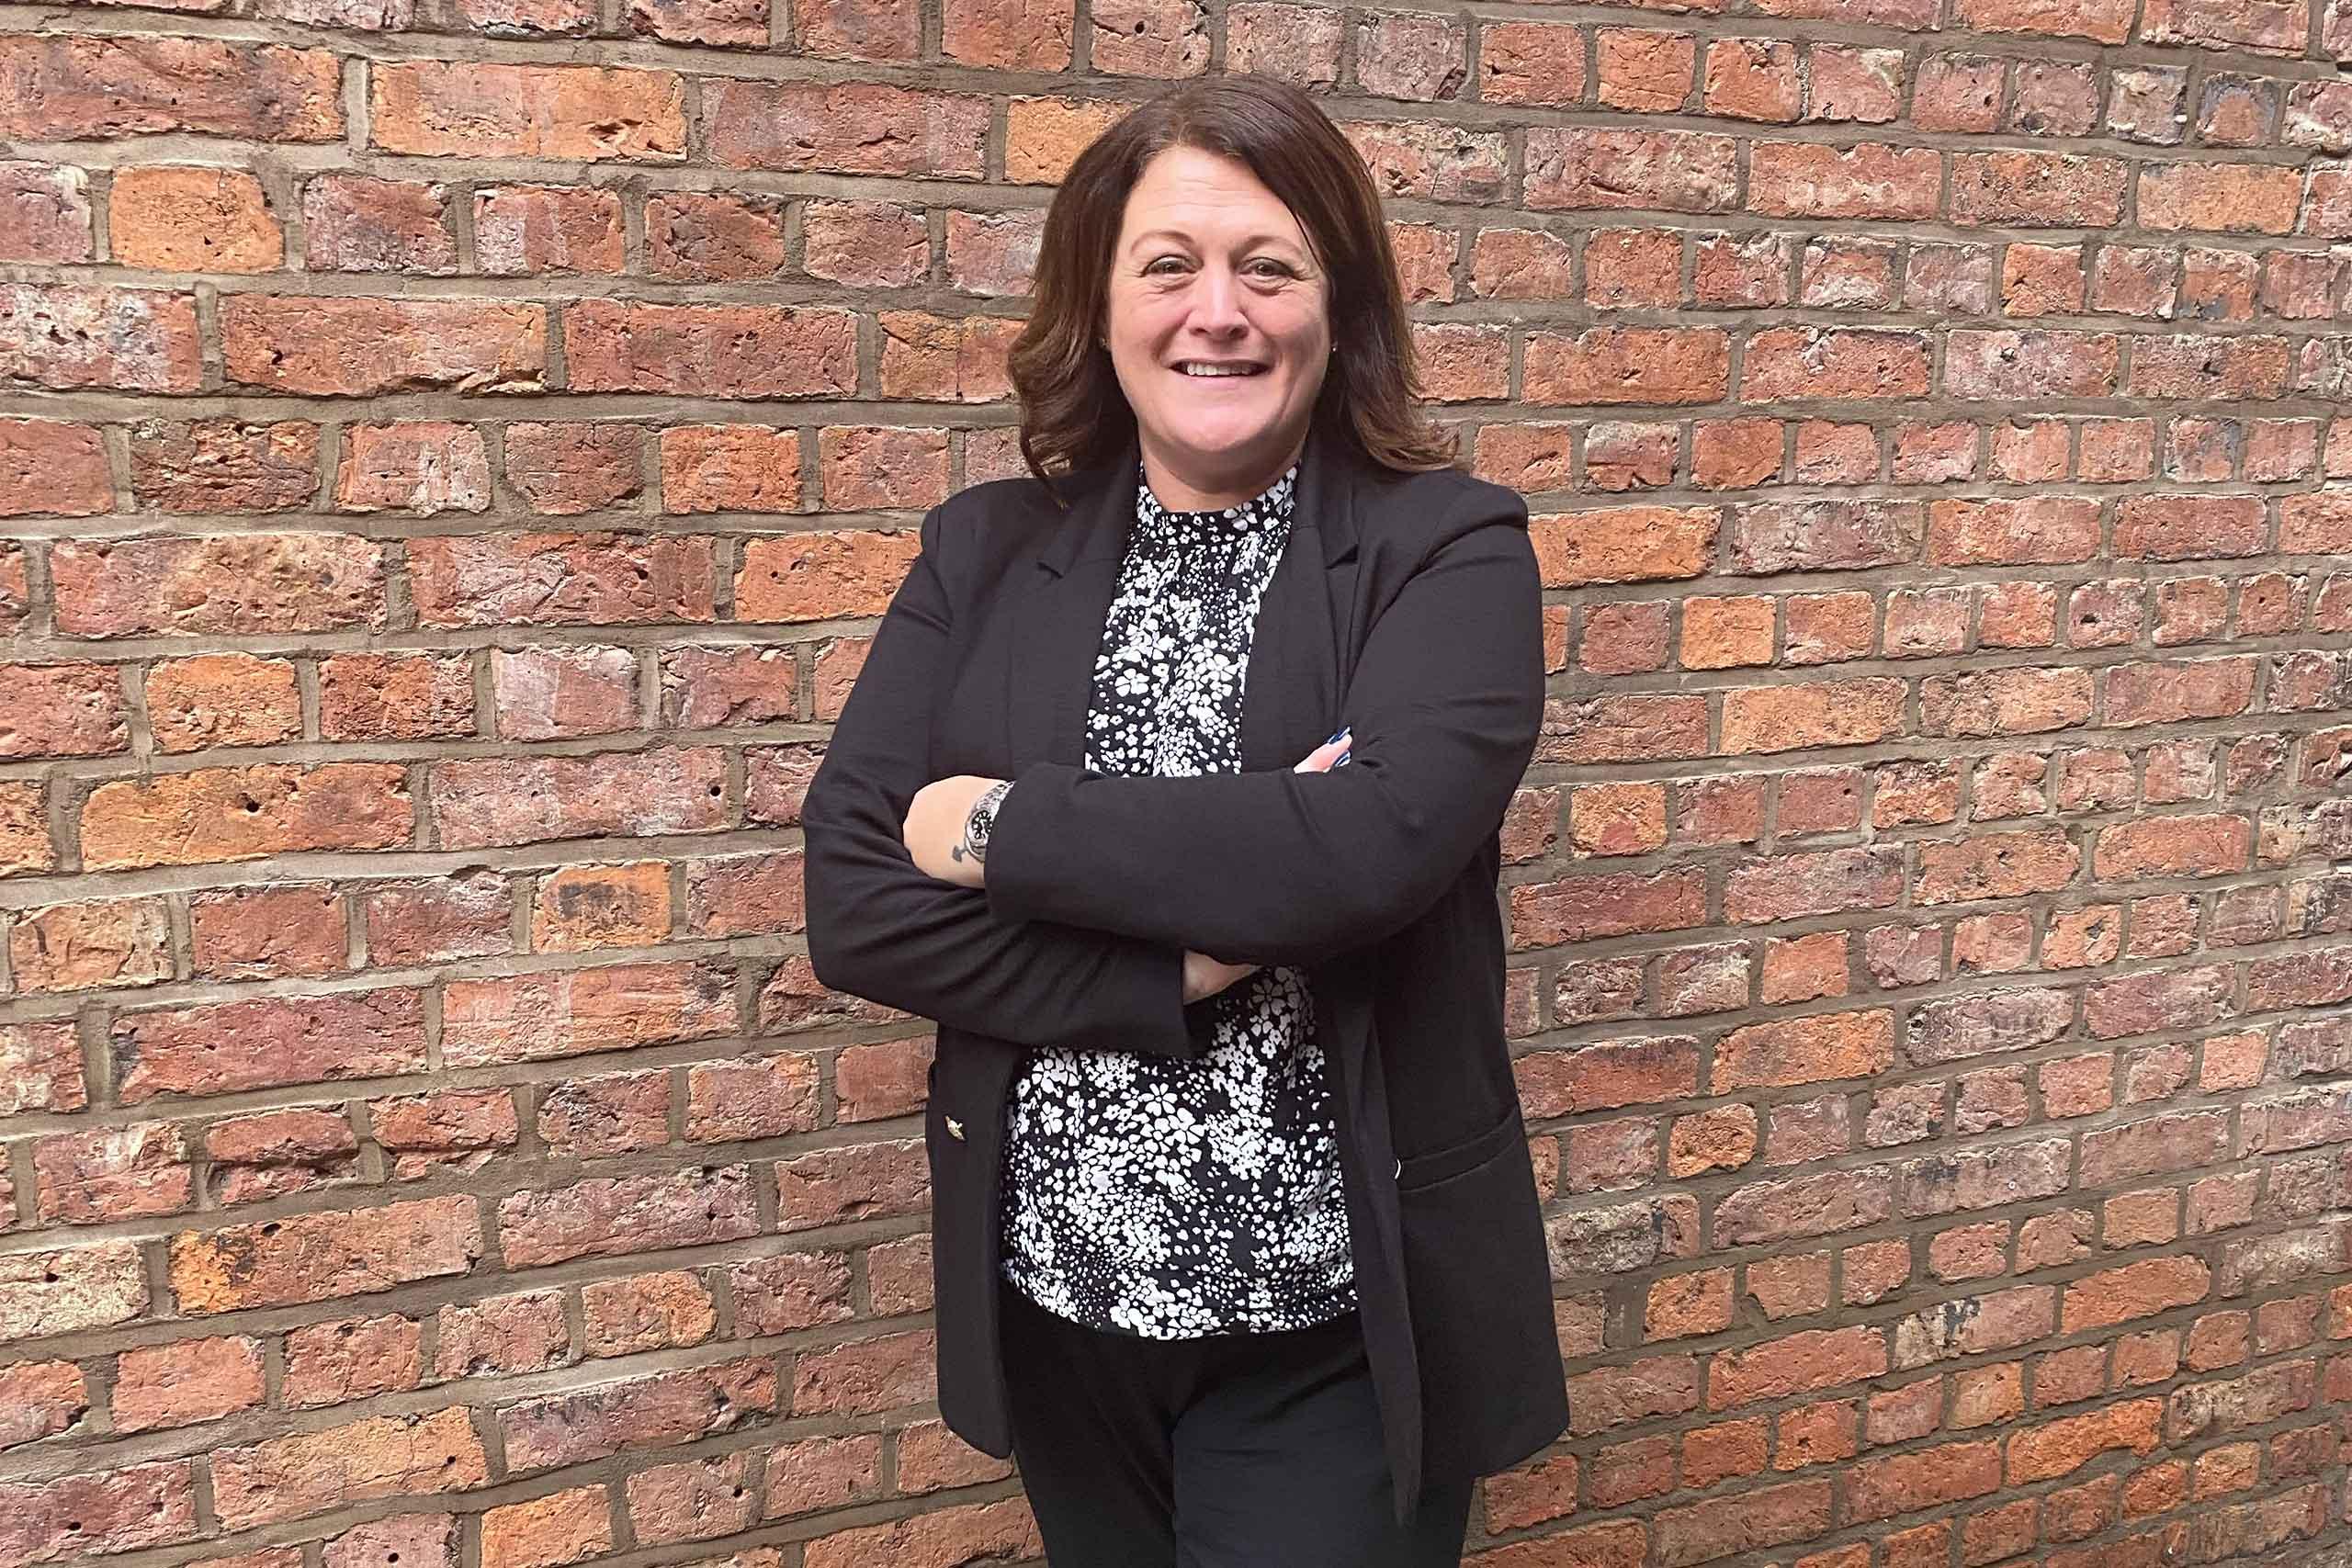 Joanna Pearson